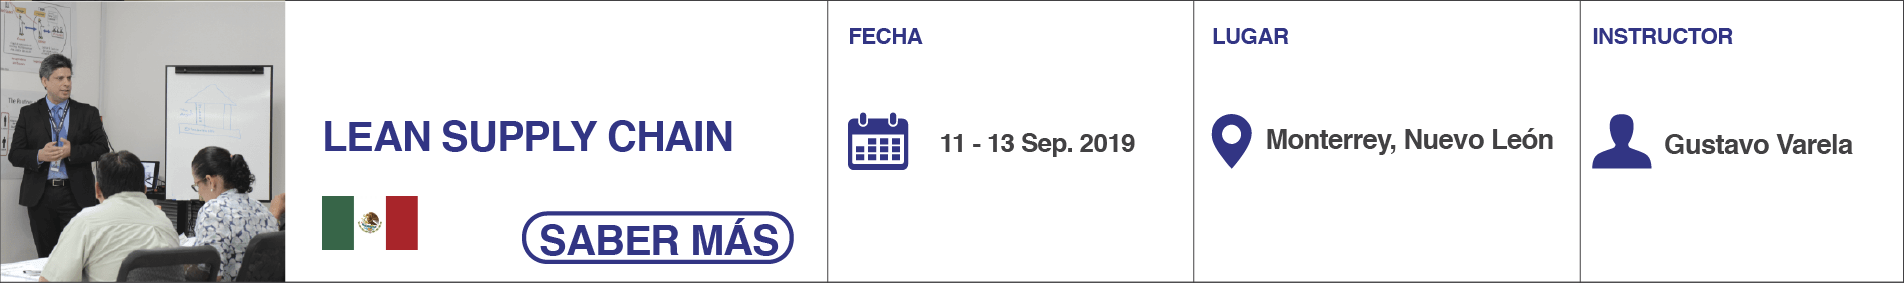 calendar-alfra-mxn-03